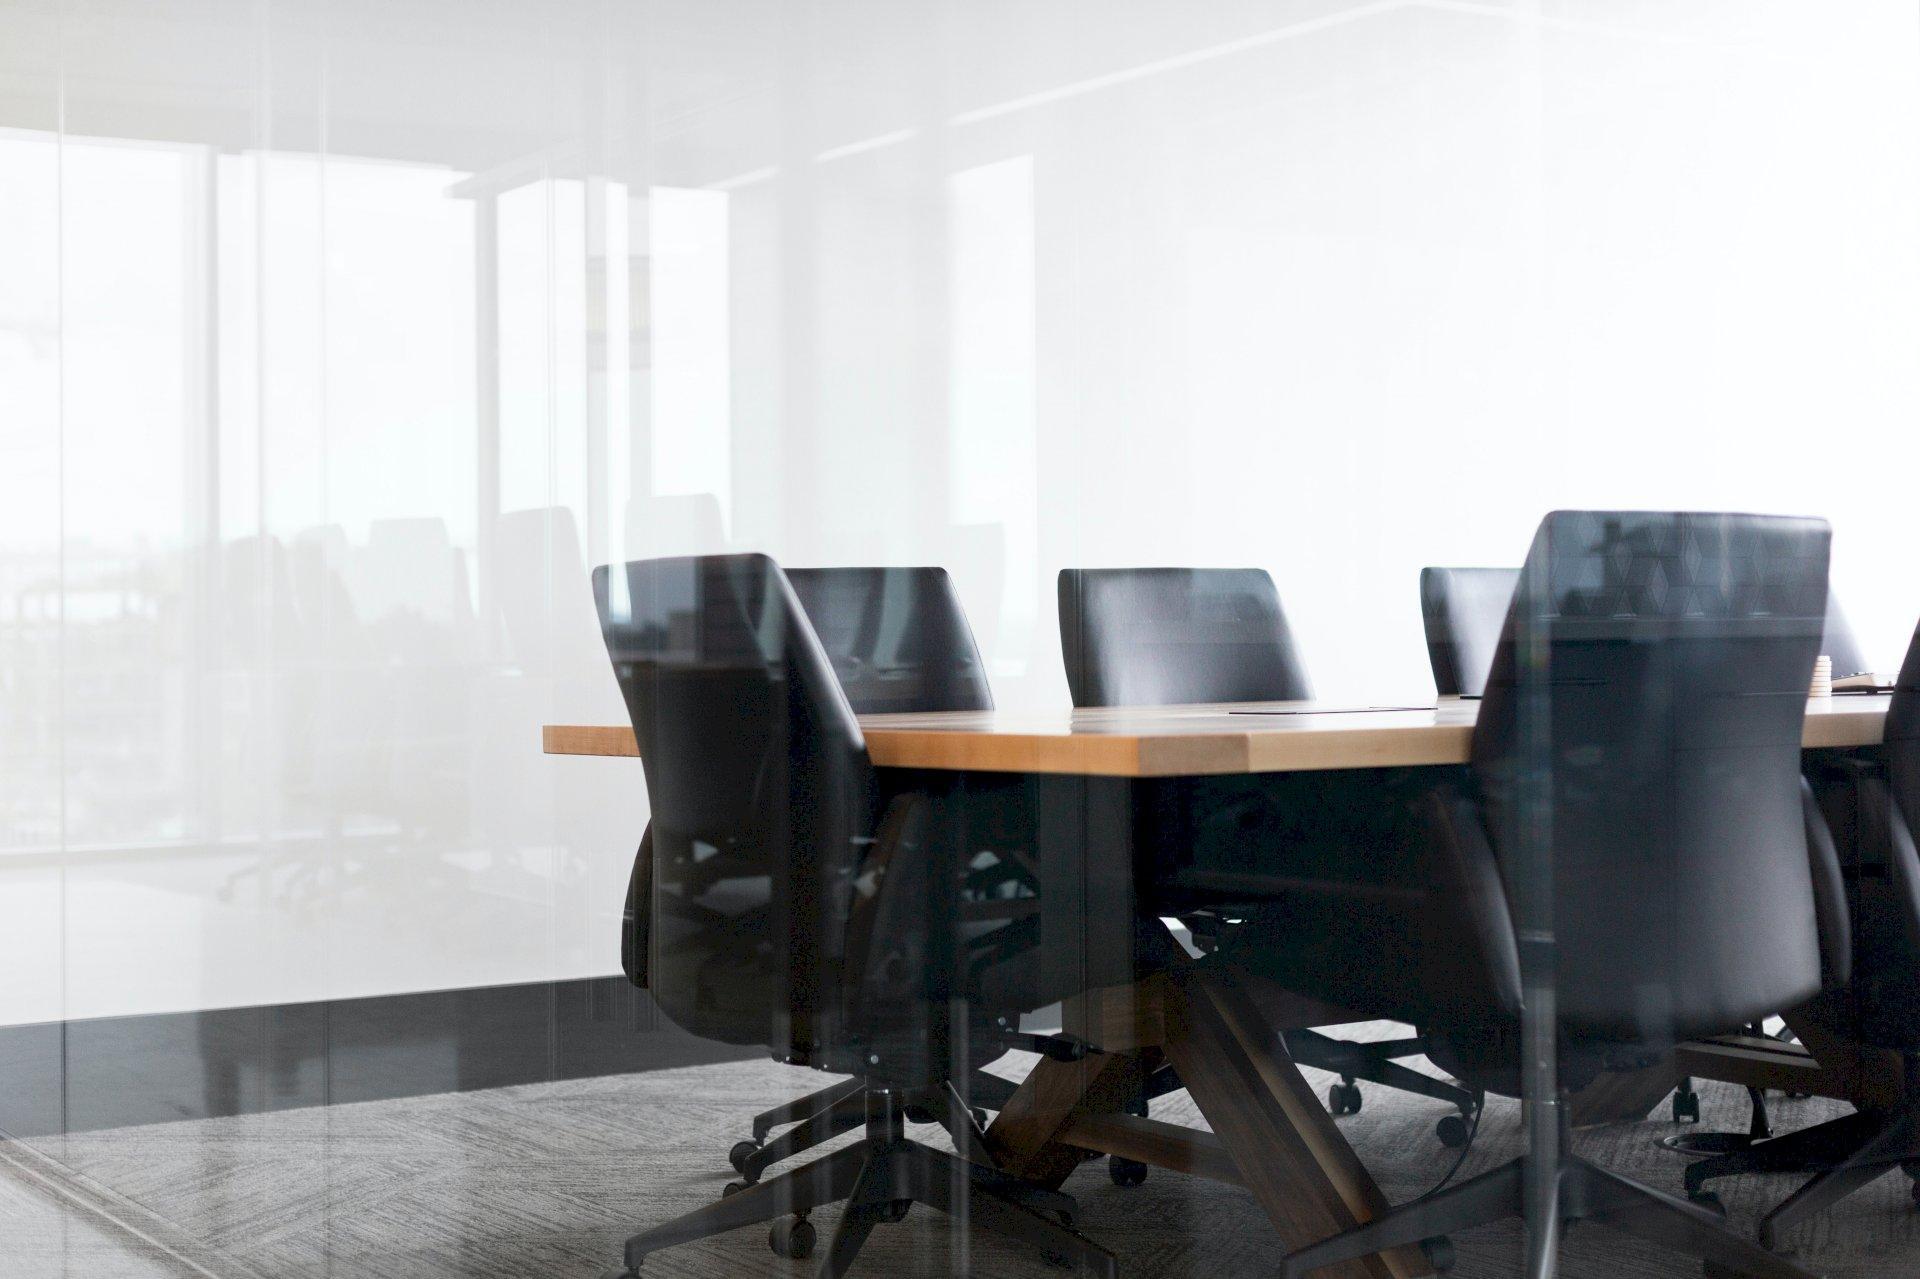 Branchelid TÜV Nederland certificeert werkconcept 6 Feet Office